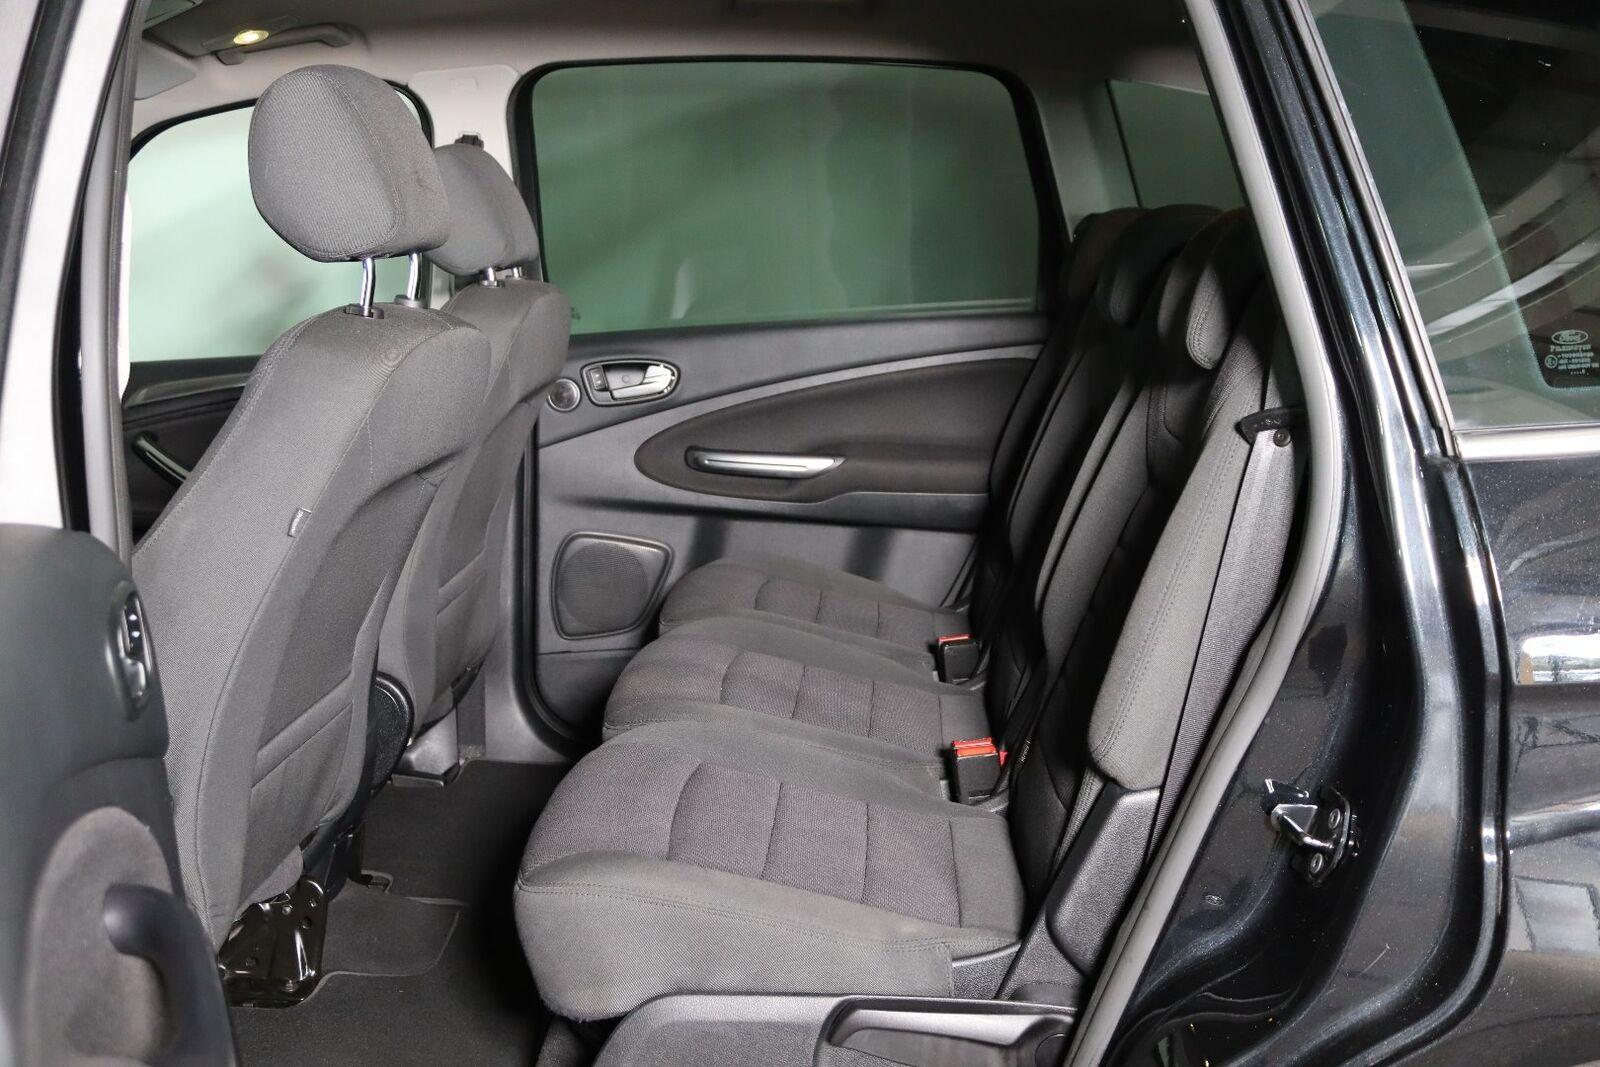 Ford S-MAX 2,0 TDCi 163 Titanium aut. 7prs - billede 7